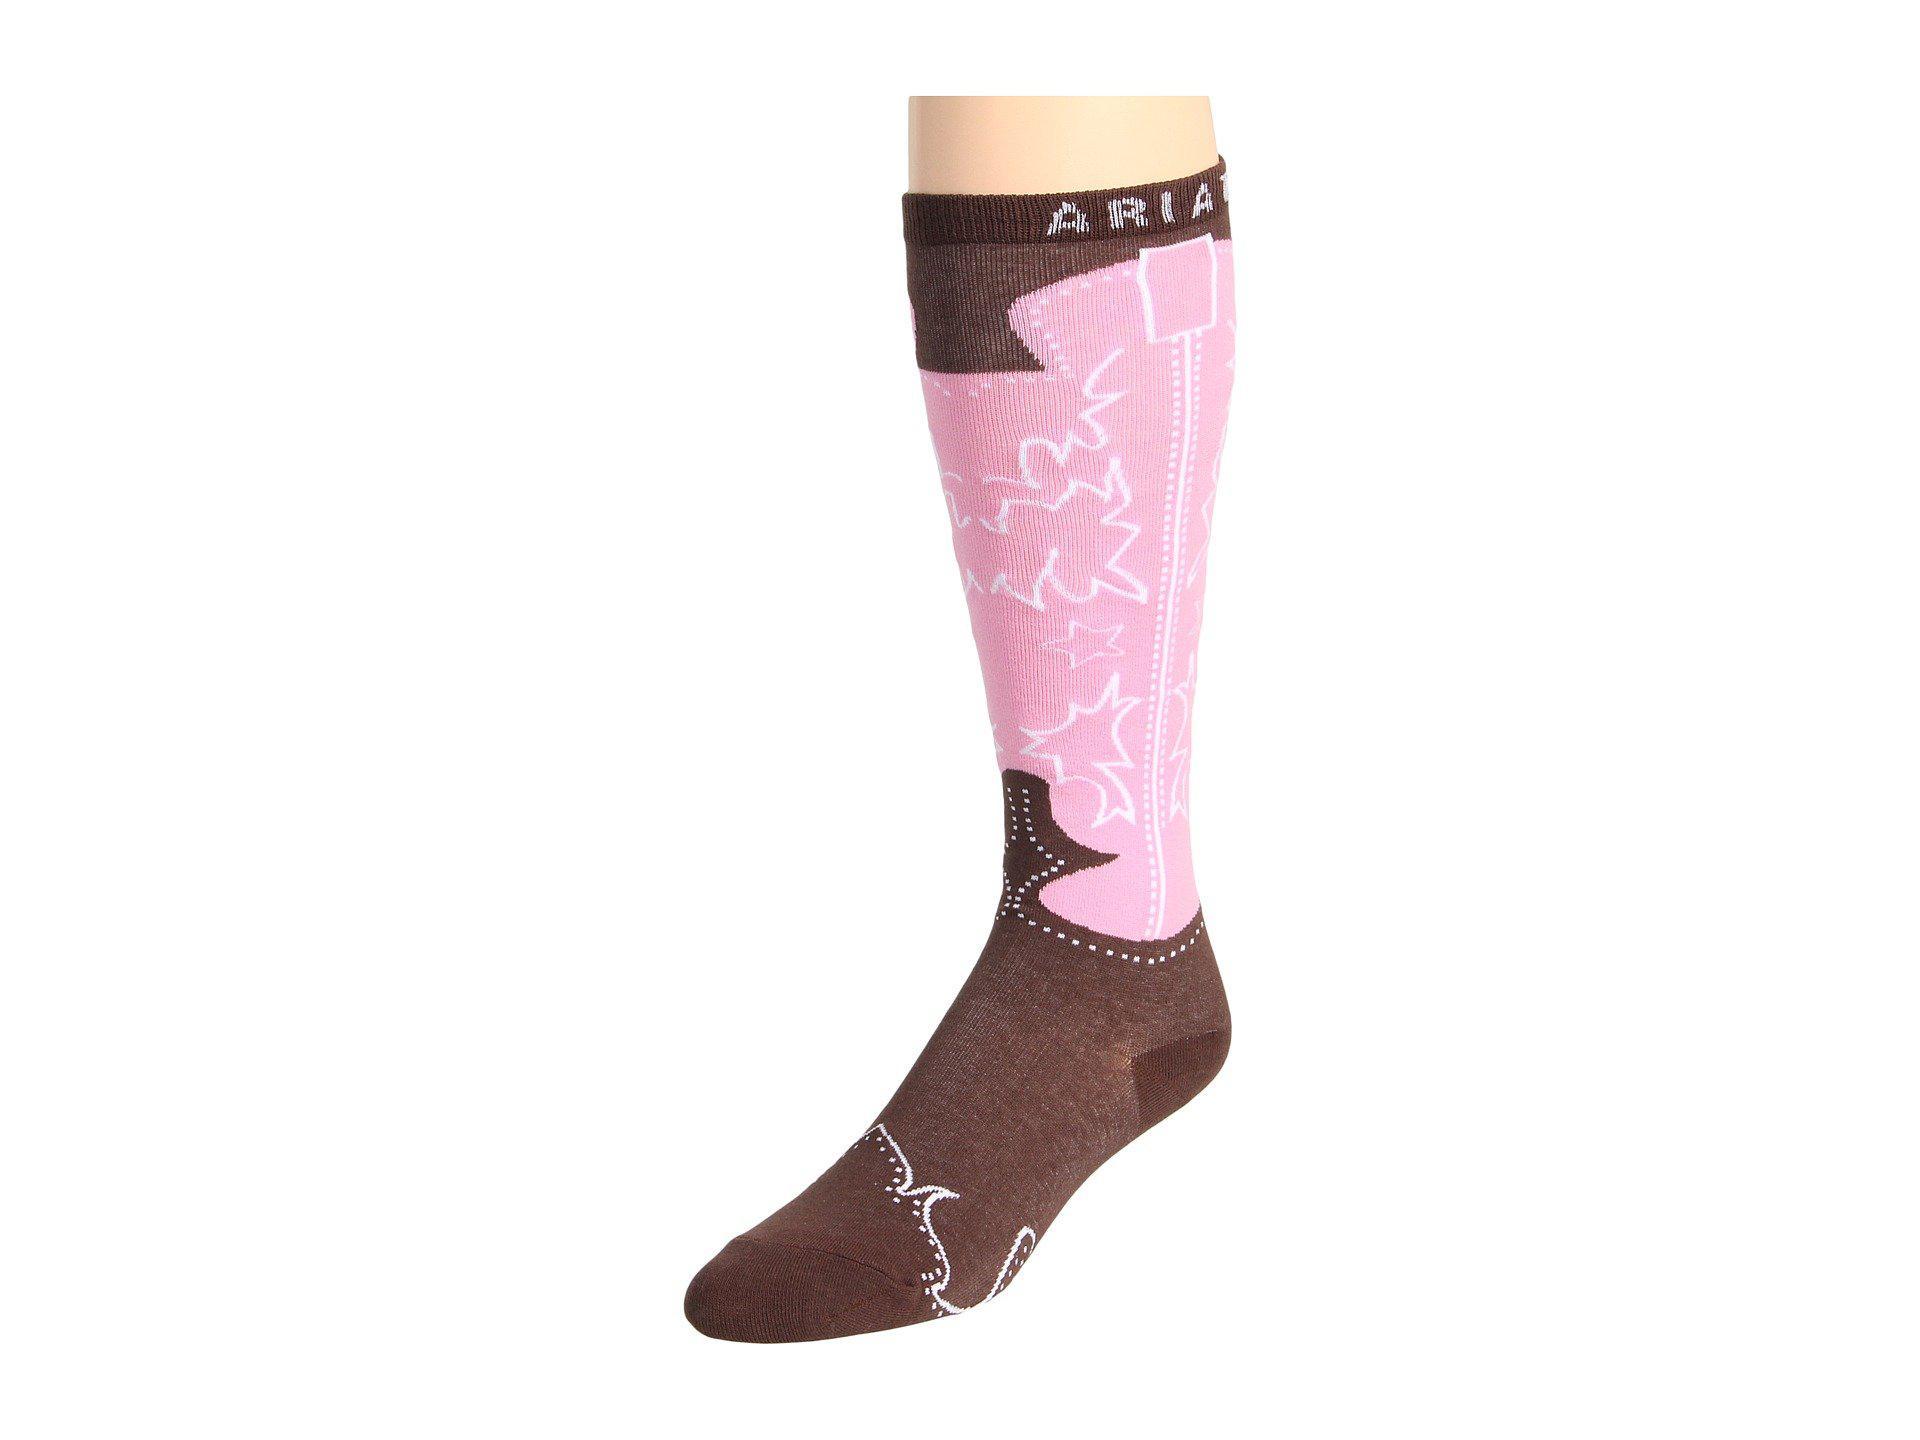 481733890ce Western Boot Sock (brown/pink) Women's Knee High Socks Shoes